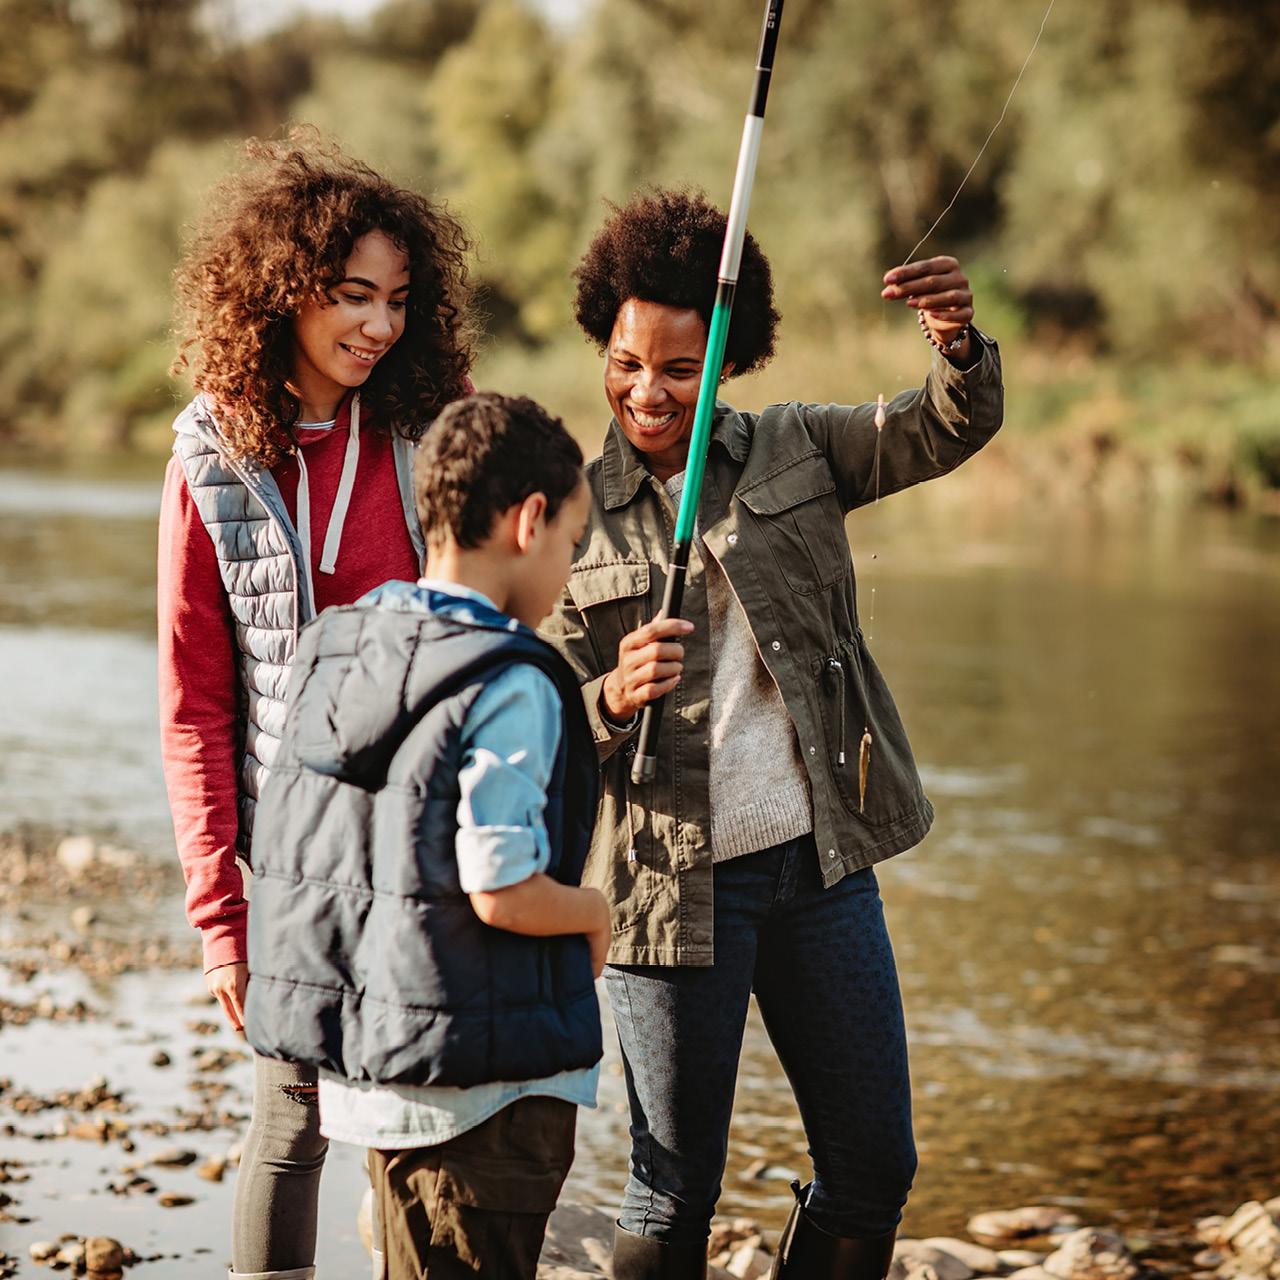 Family-Friendly Outdoor Activities